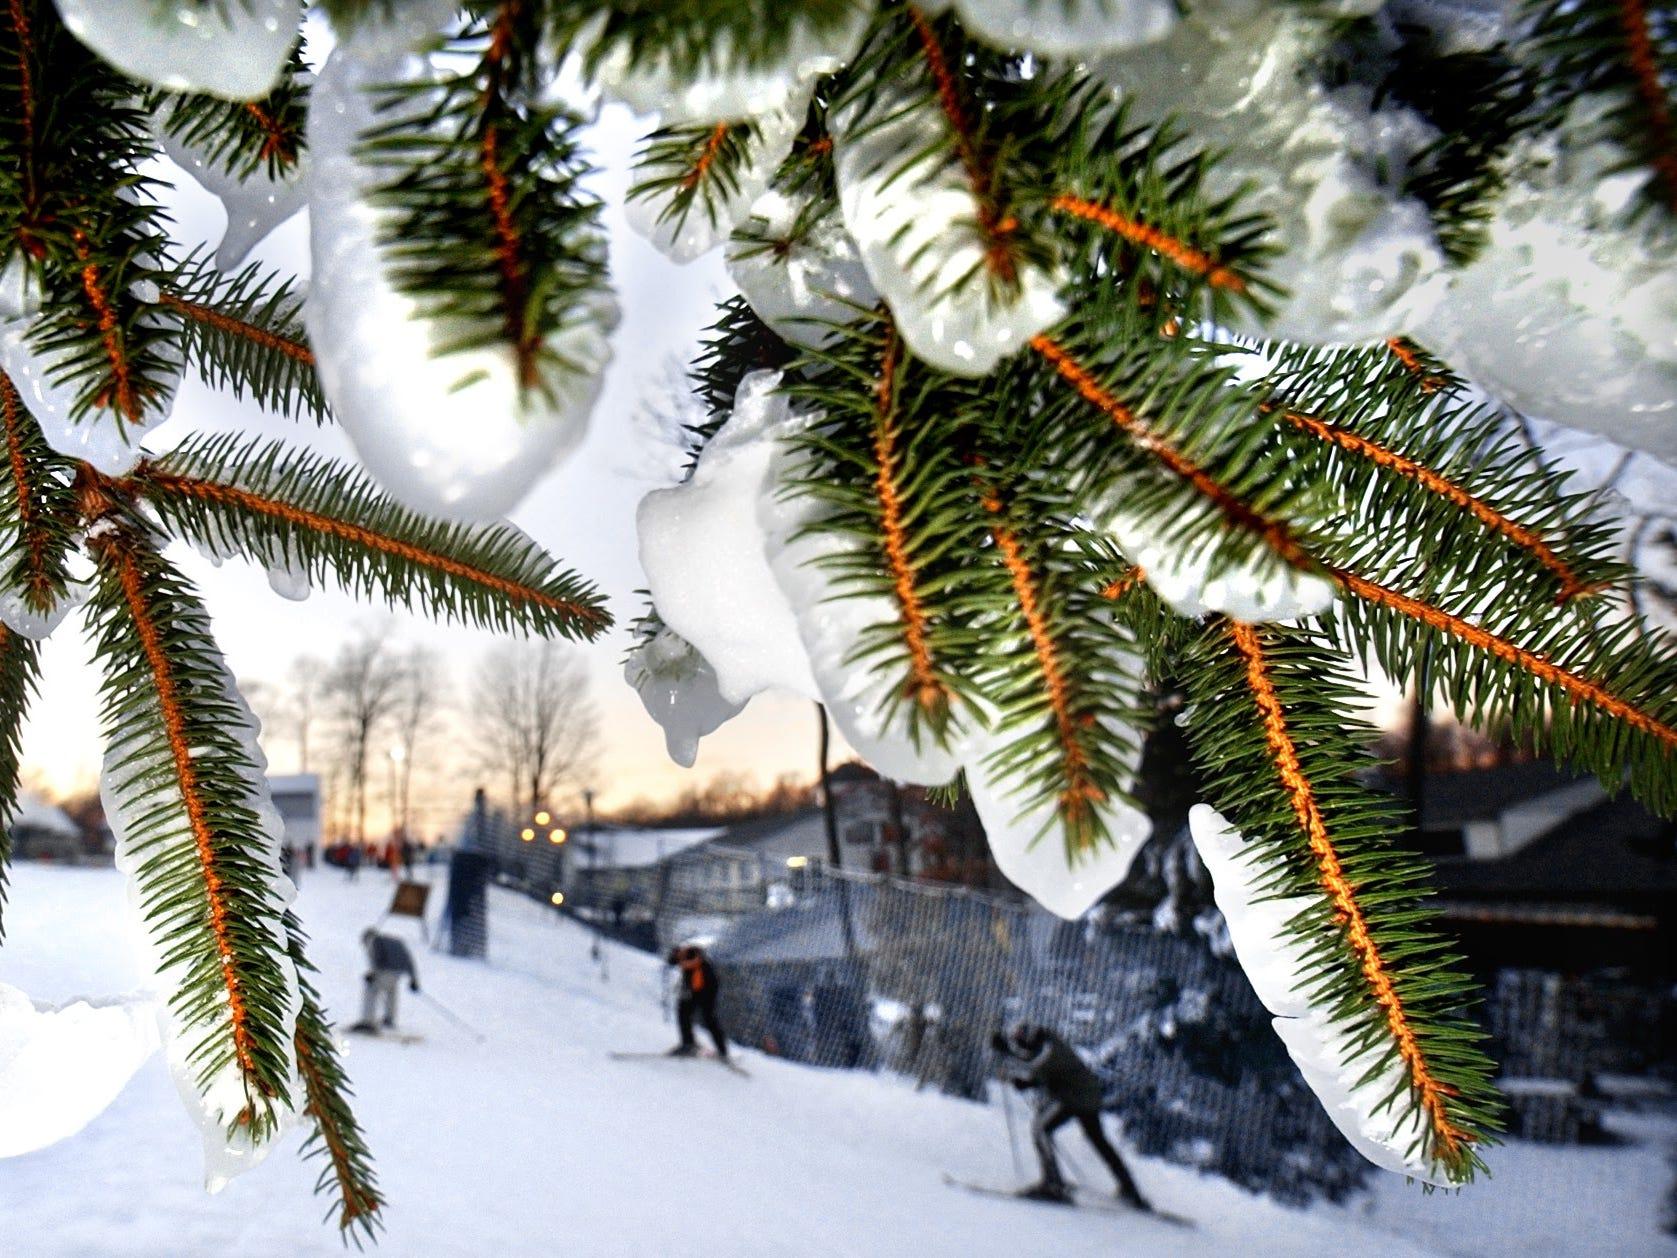 A man made winter wonderland on Ski Roundtop December 26, 2001.